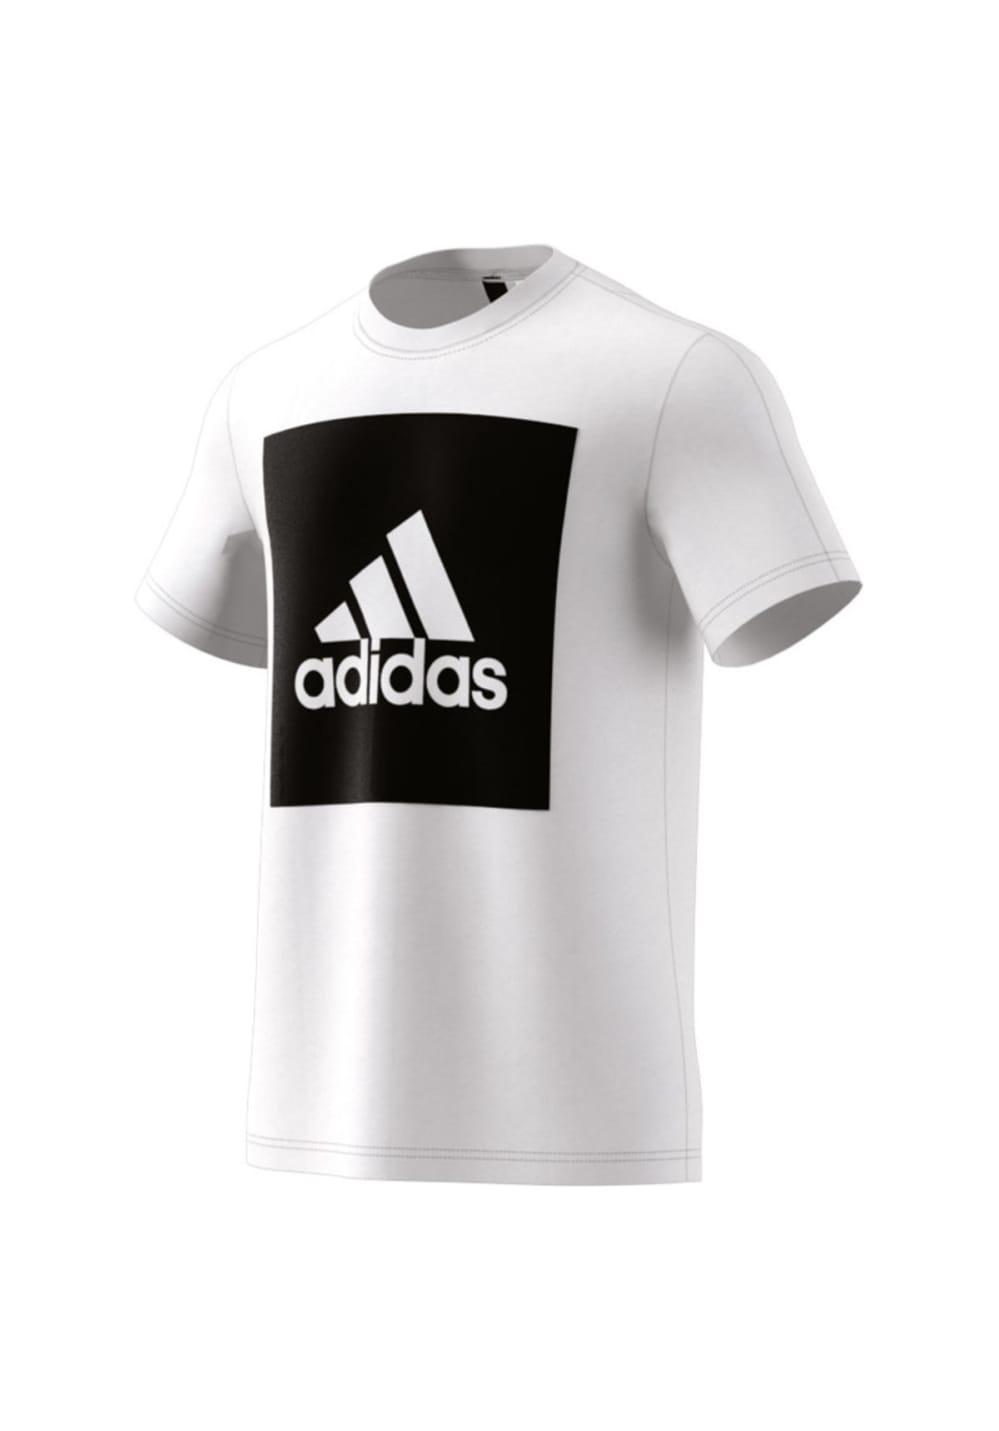 07afd1400 Previous. Next. adidas. Essentials Big Box Logo Tee - Running tops for Men